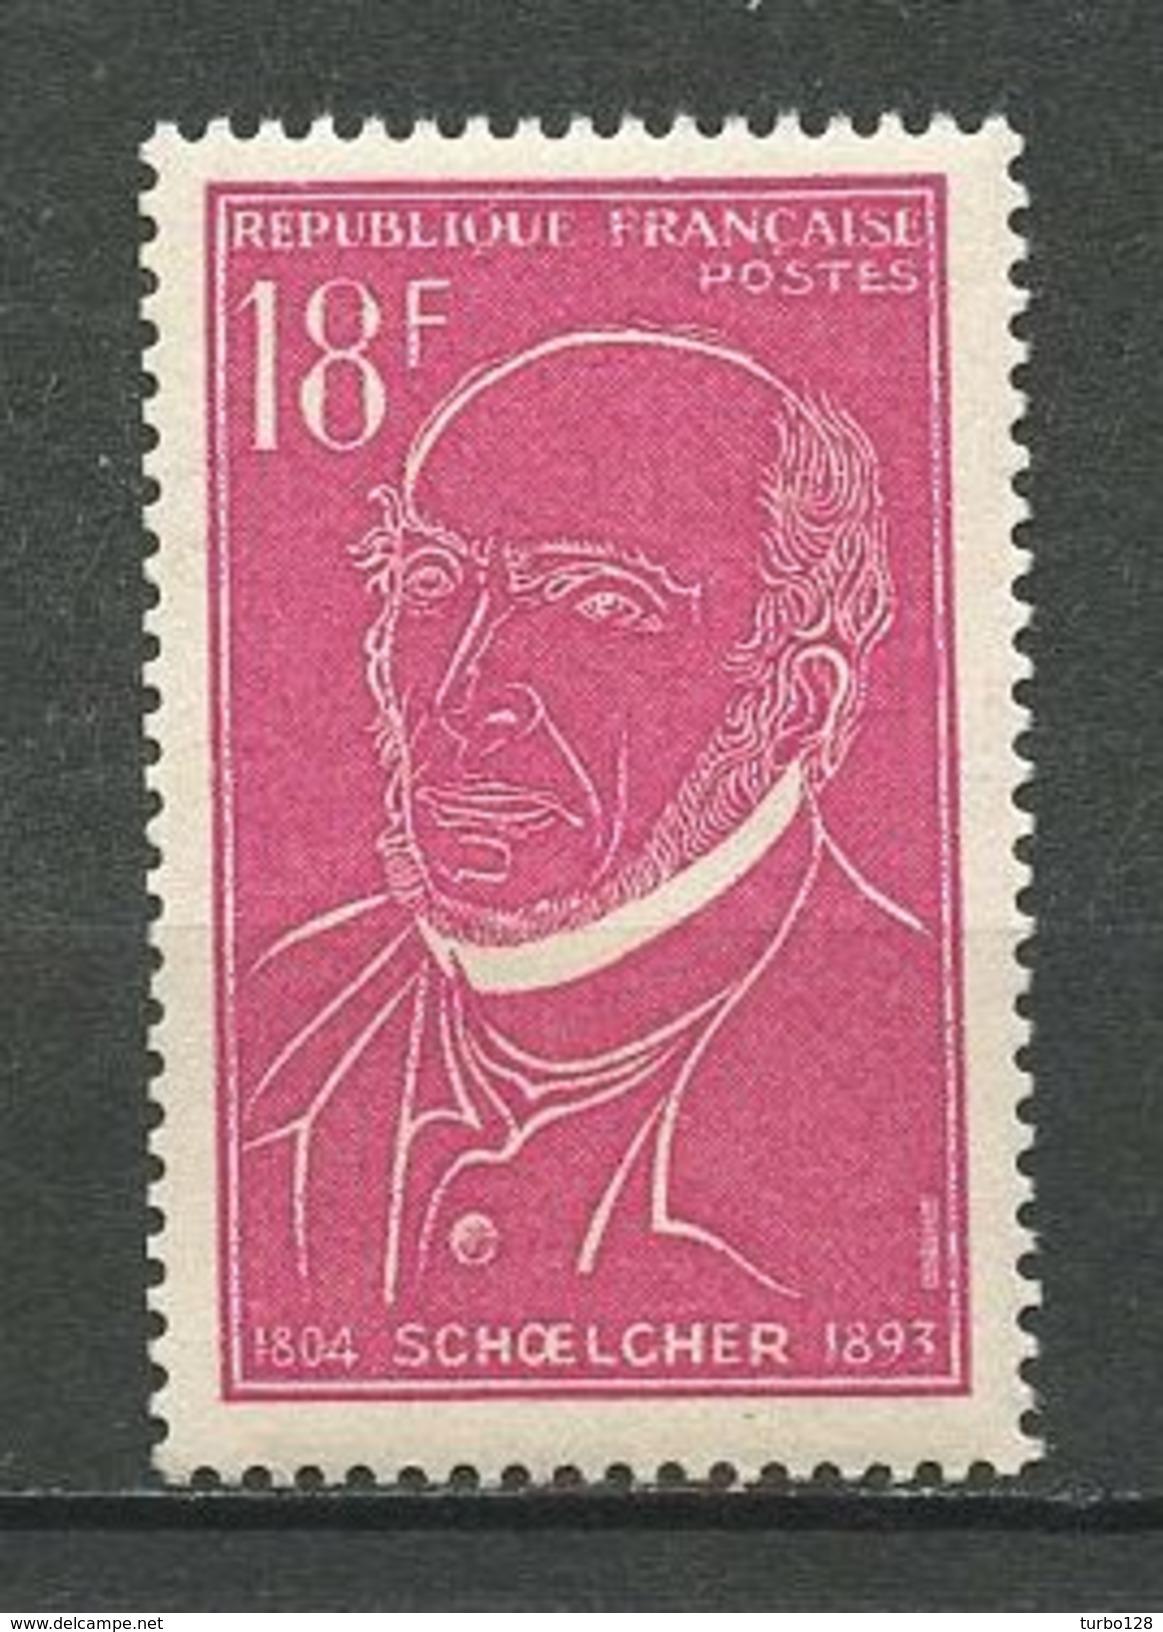 FRANCE 1957 N° 1092 ** Neuf MNH Superbe Cote 0,80 € Victor Schoelcher Politique Fir Abolir L'esclavage - France